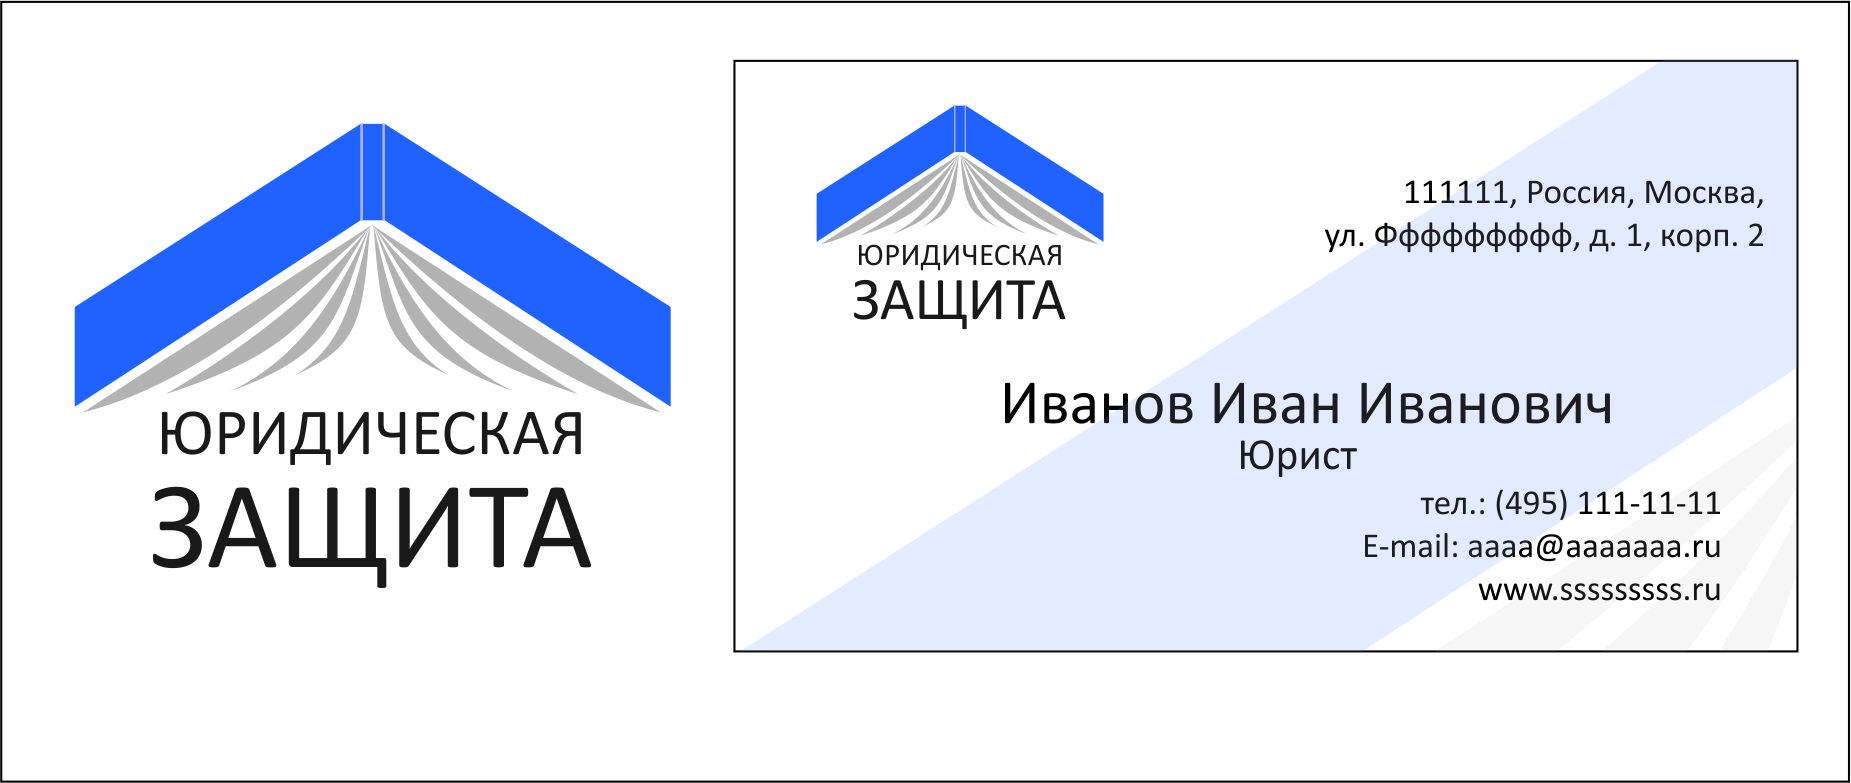 Разработка логотипа для юридической компании фото f_20255dd92aca8be1.jpg